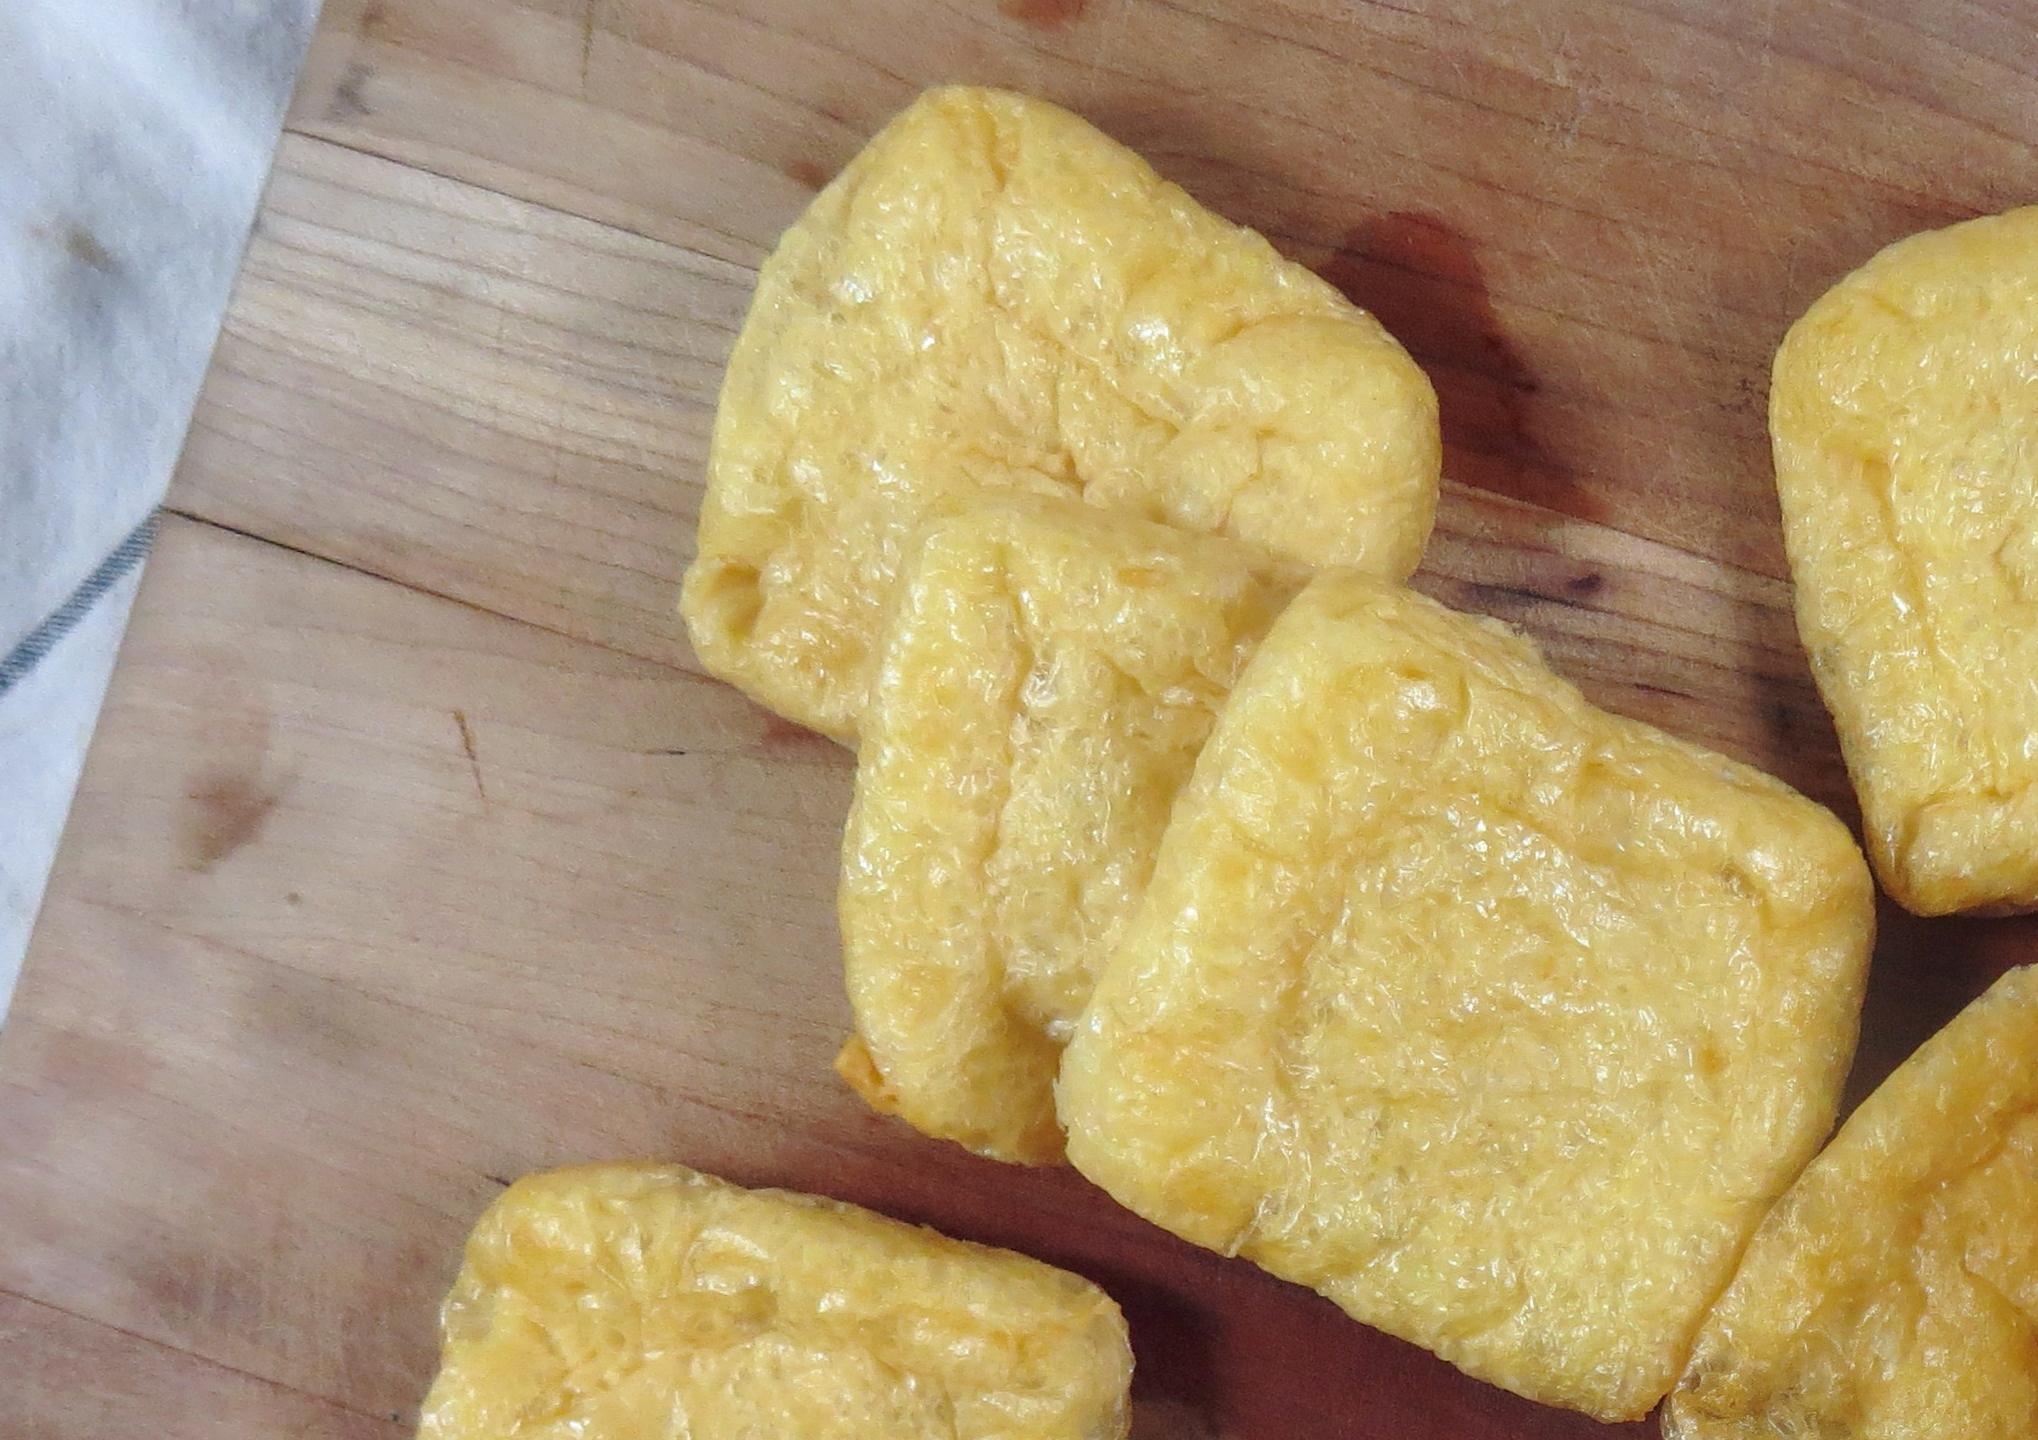 Fried Tofu Pouch